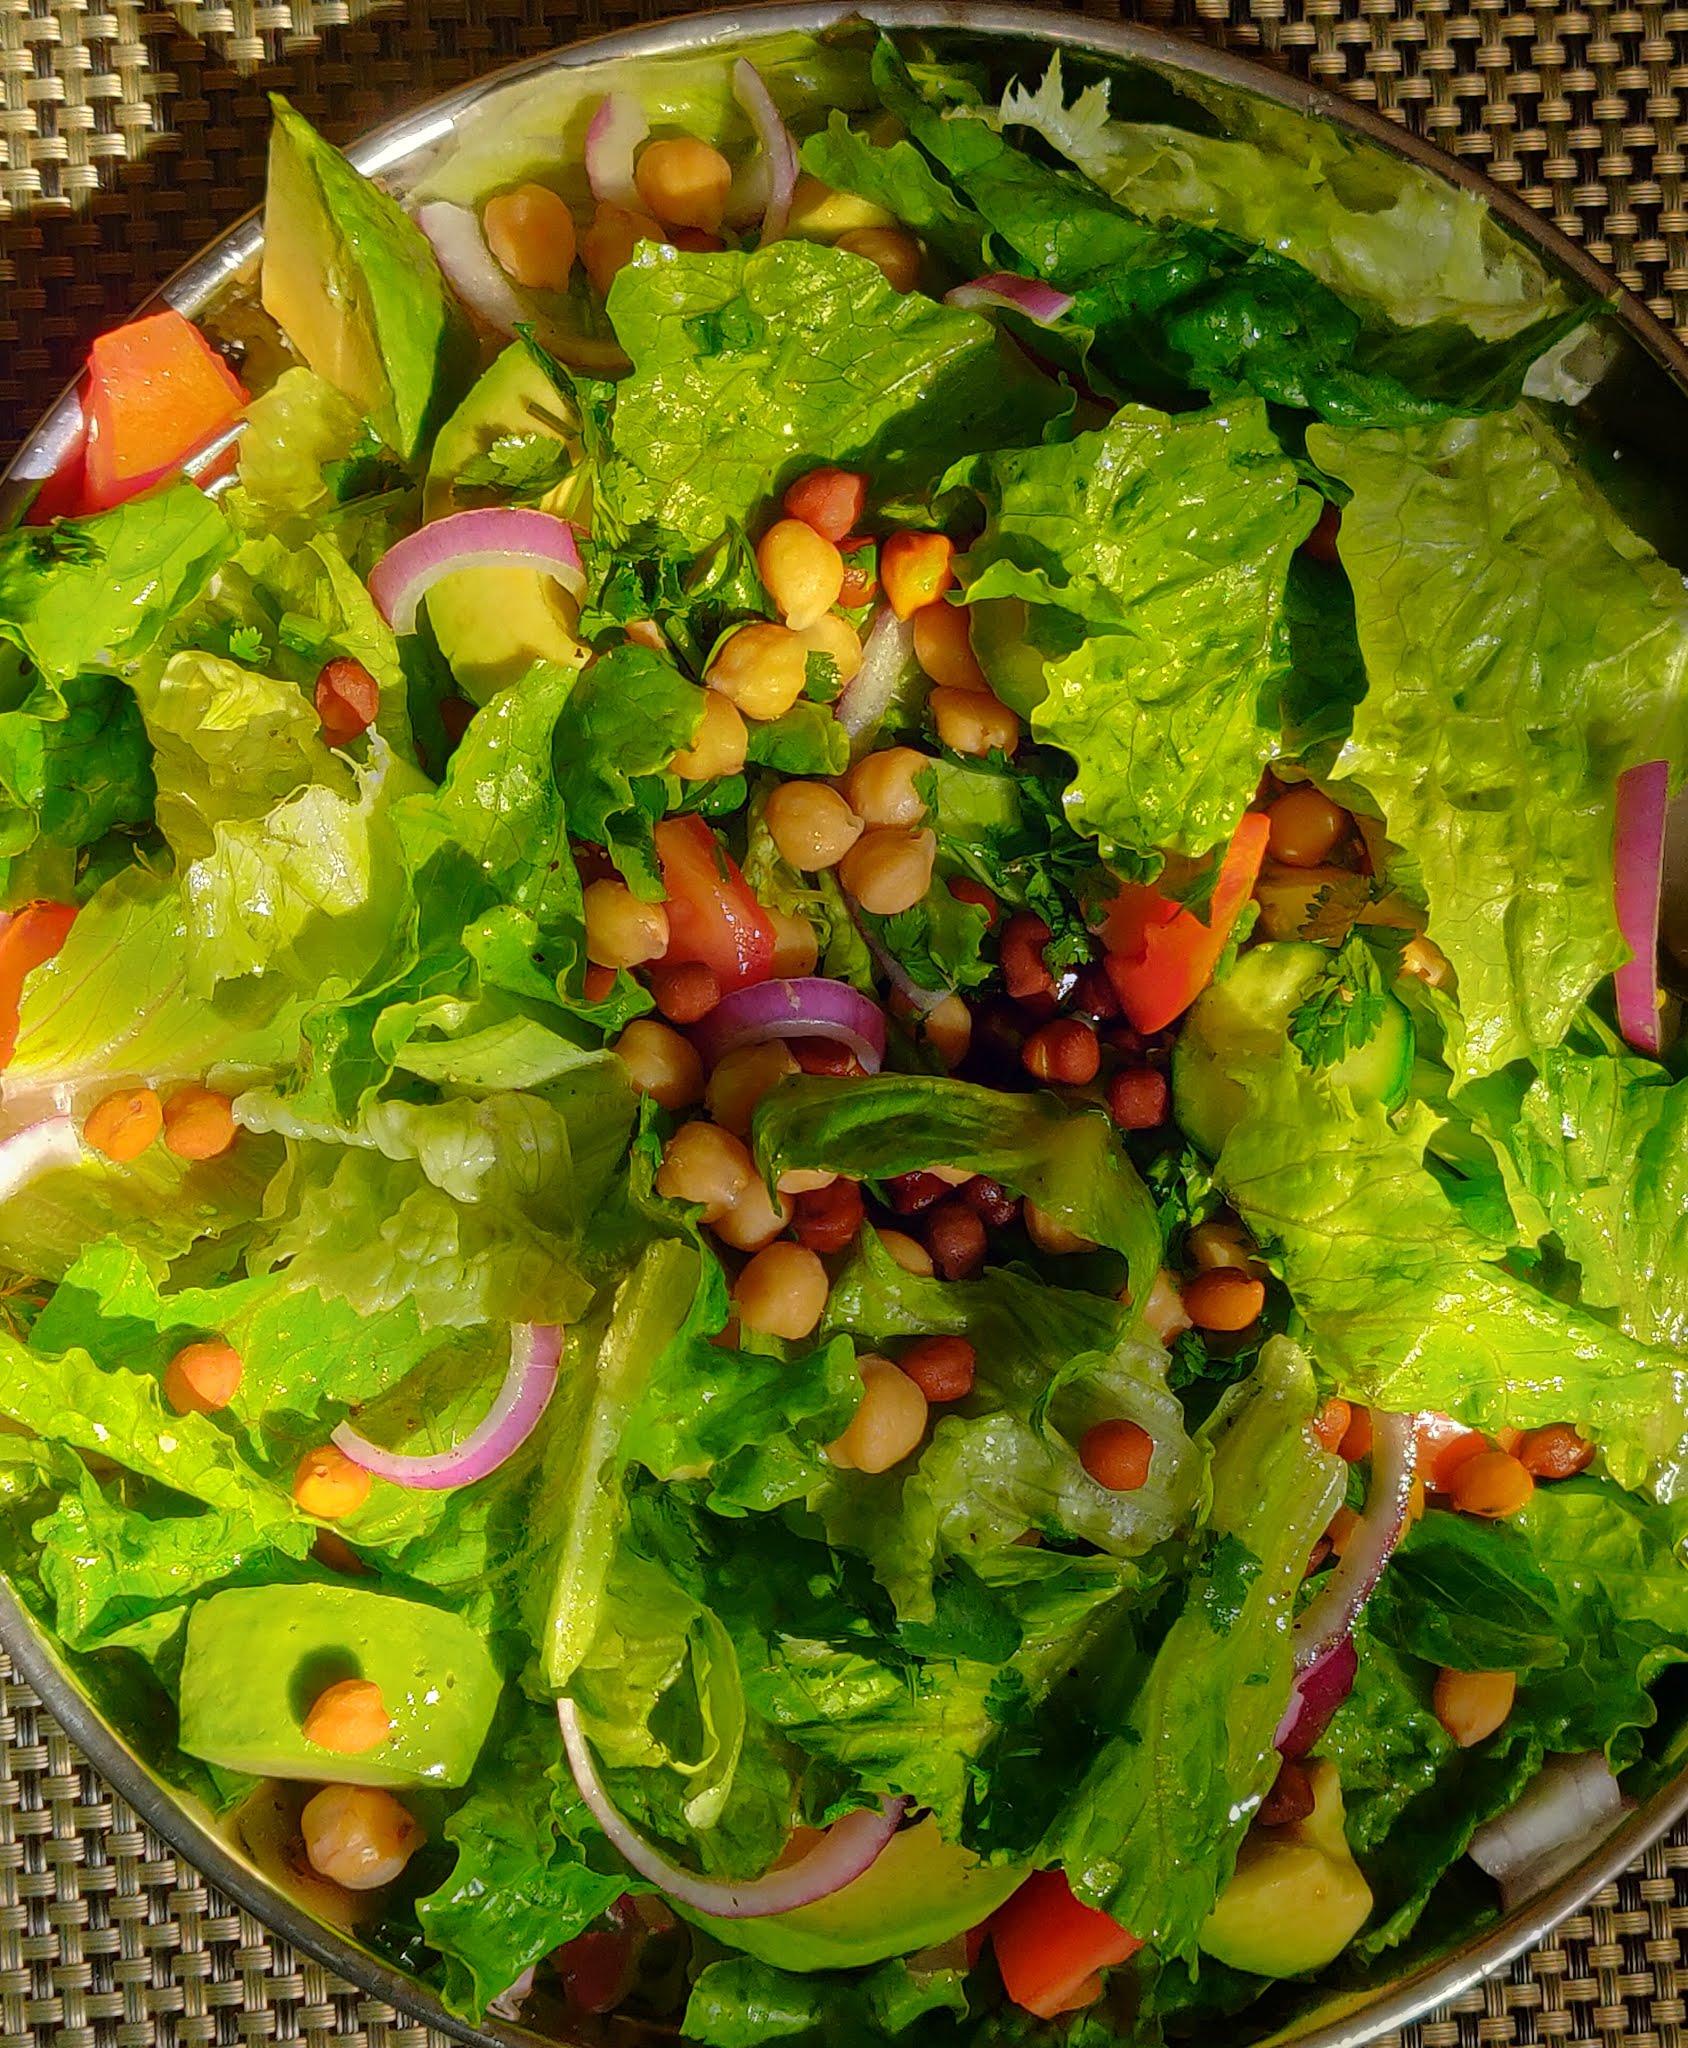 Chickpea salad recipe Indian   channa salad recipe   Garbanzo salad recipe   Kondakadalai salad